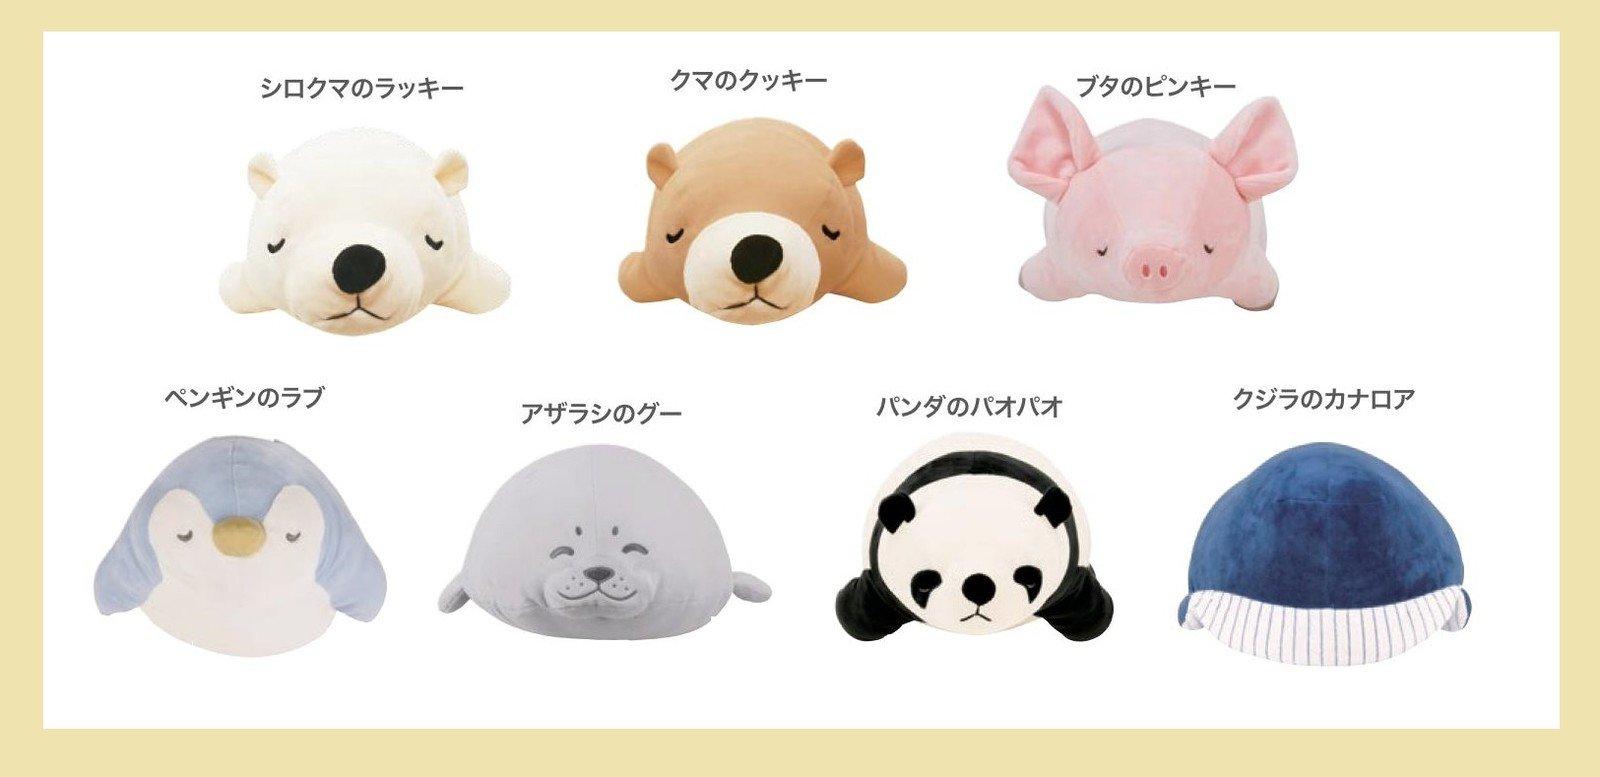 Livheart Premium Nemu Nemu Sleepy head Animals Body Pillow White Plush Polar Bear 'Lucky' size M (21''x9.5''x5.5'') Japan import 28976-11 Huggable Super Soft Stuffed Toy by Livheart (Image #3)